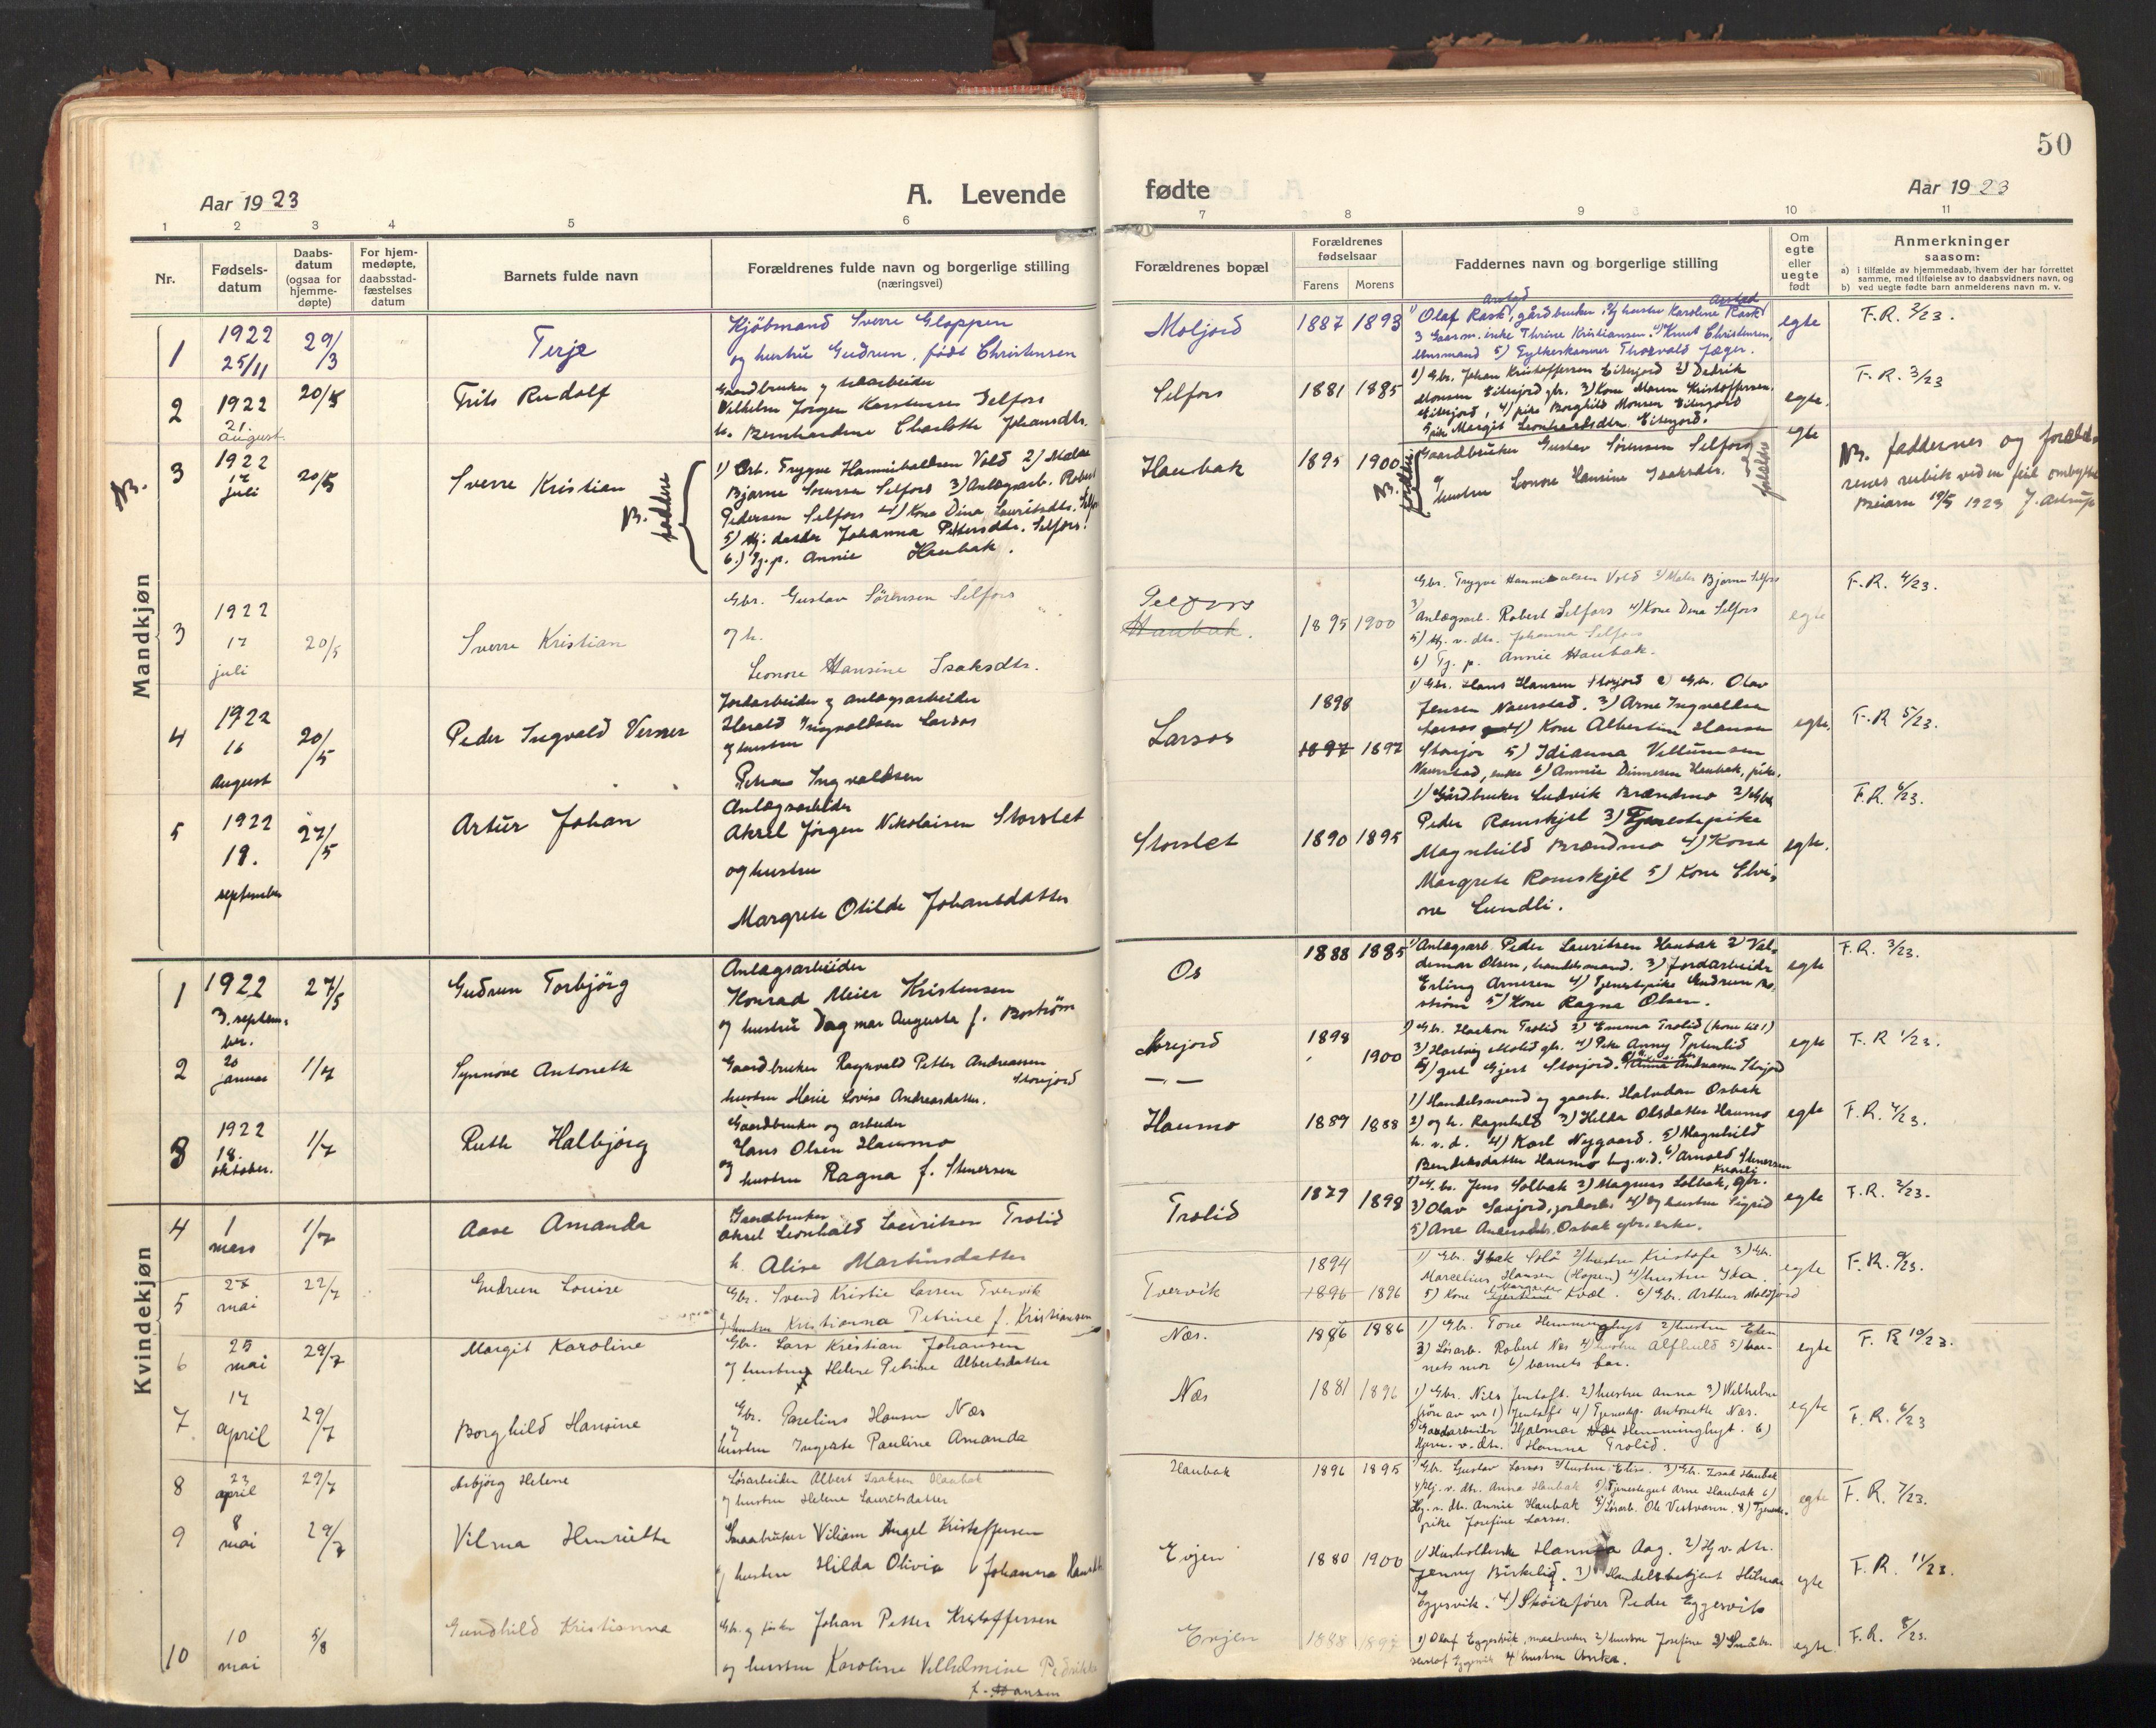 SAT, Ministerialprotokoller, klokkerbøker og fødselsregistre - Nordland, 846/L0650: Ministerialbok nr. 846A08, 1916-1935, s. 50